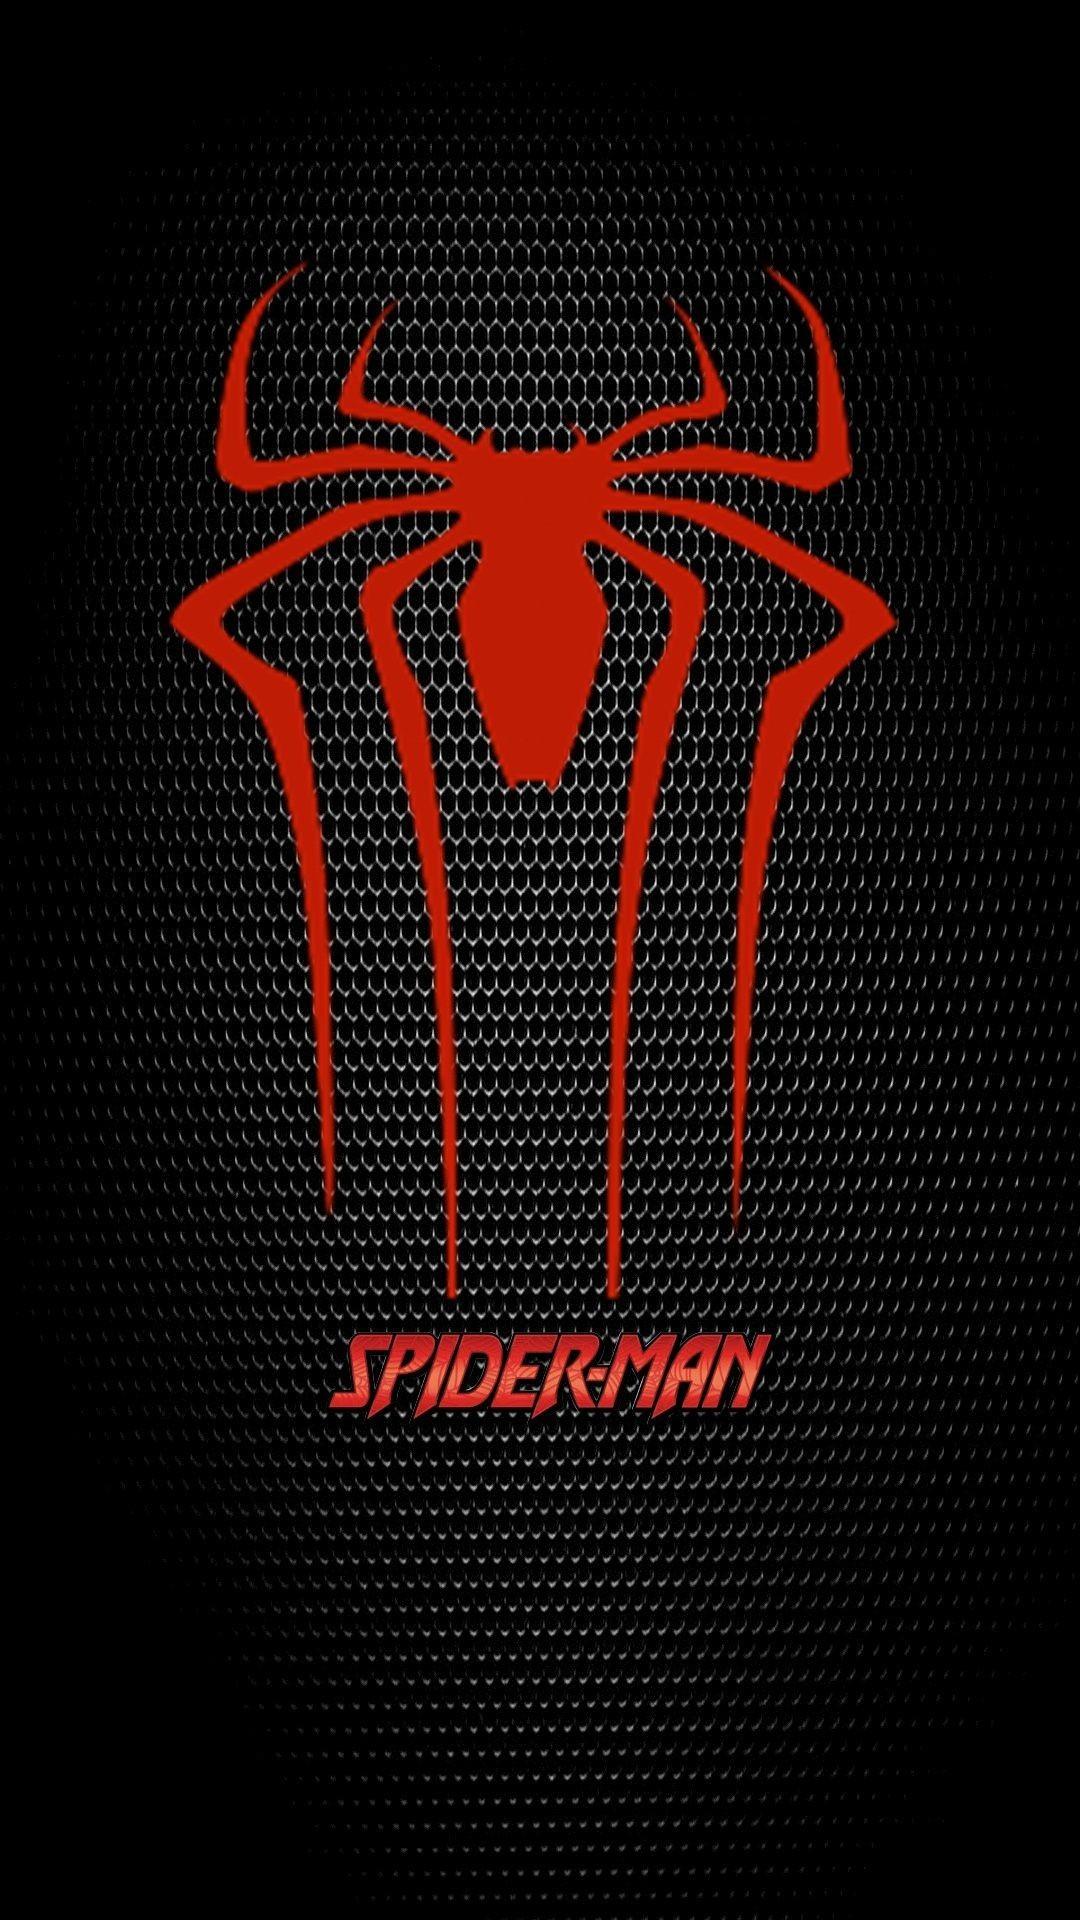 Spiderman Wallpaper 42 Wallpaper Background Hd   Movies Wallpapers    Pinterest   Spiderman, Spiderman movie and Spider-Man